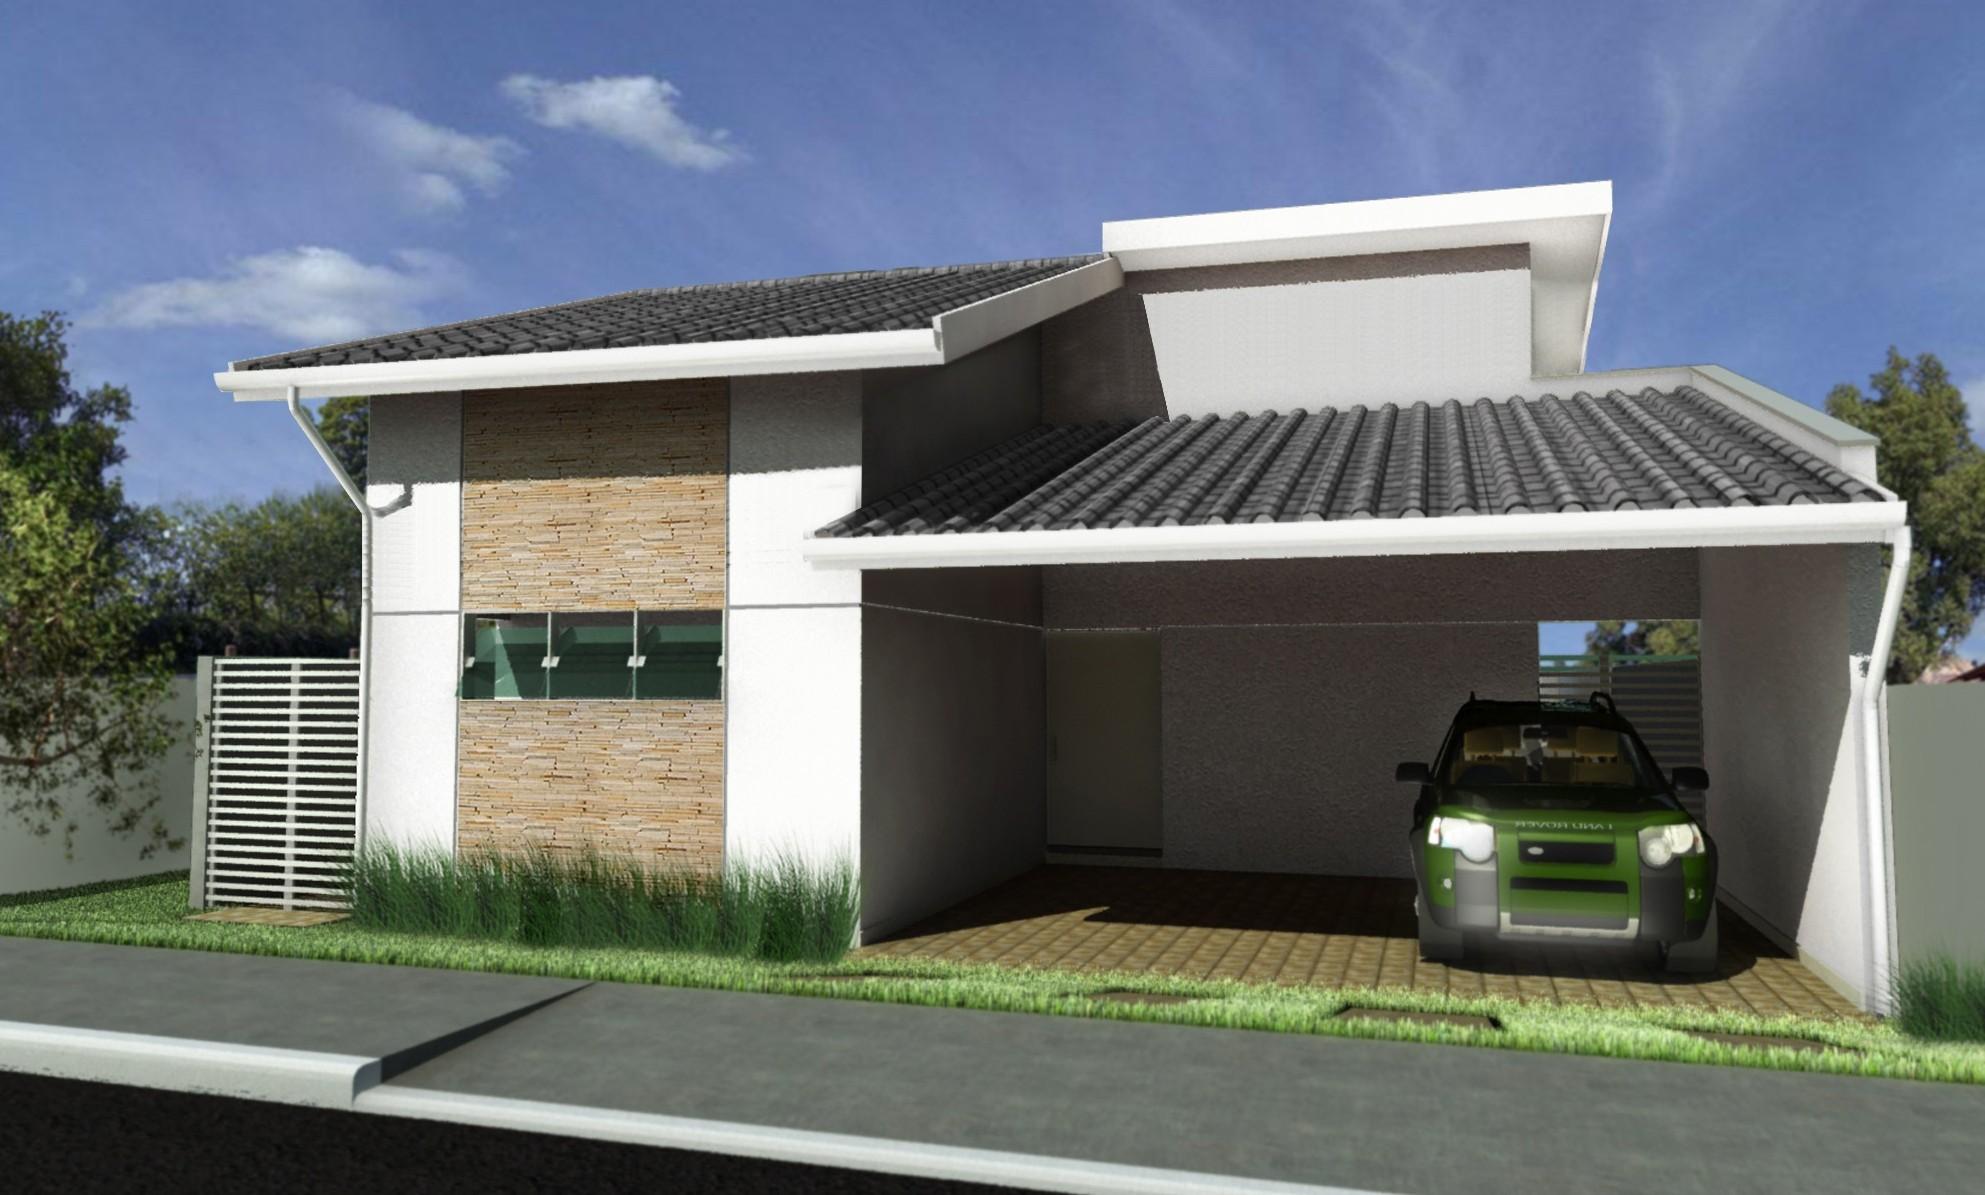 Imagens de #445887 18 Modelos de Fachadas de Casas Modernas 1985x1195 px 3684 Banheiros Residenciais Modernos